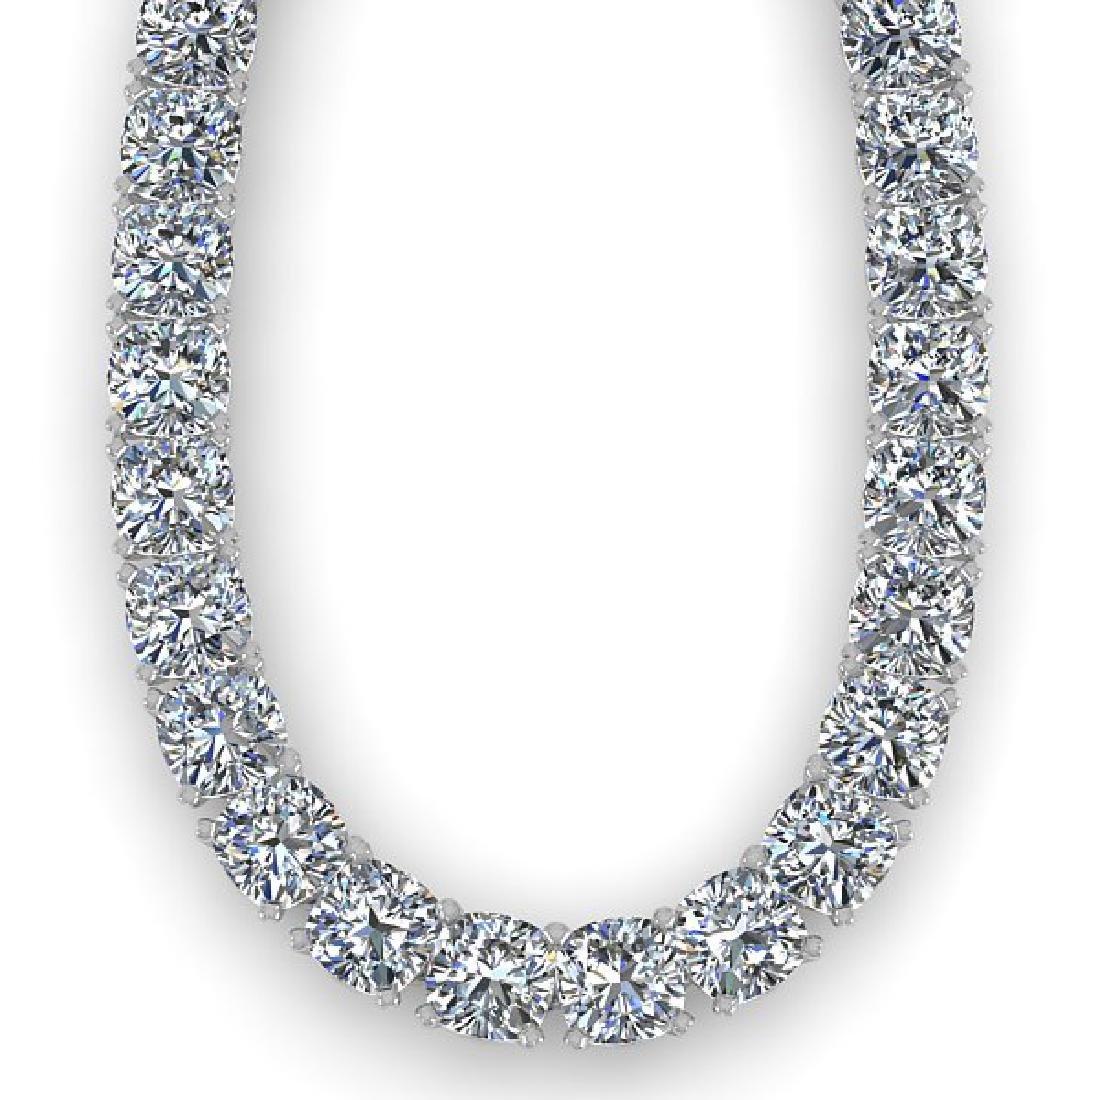 40 CTW Cushion Cut Certified SI Diamond Necklace 14K - 2